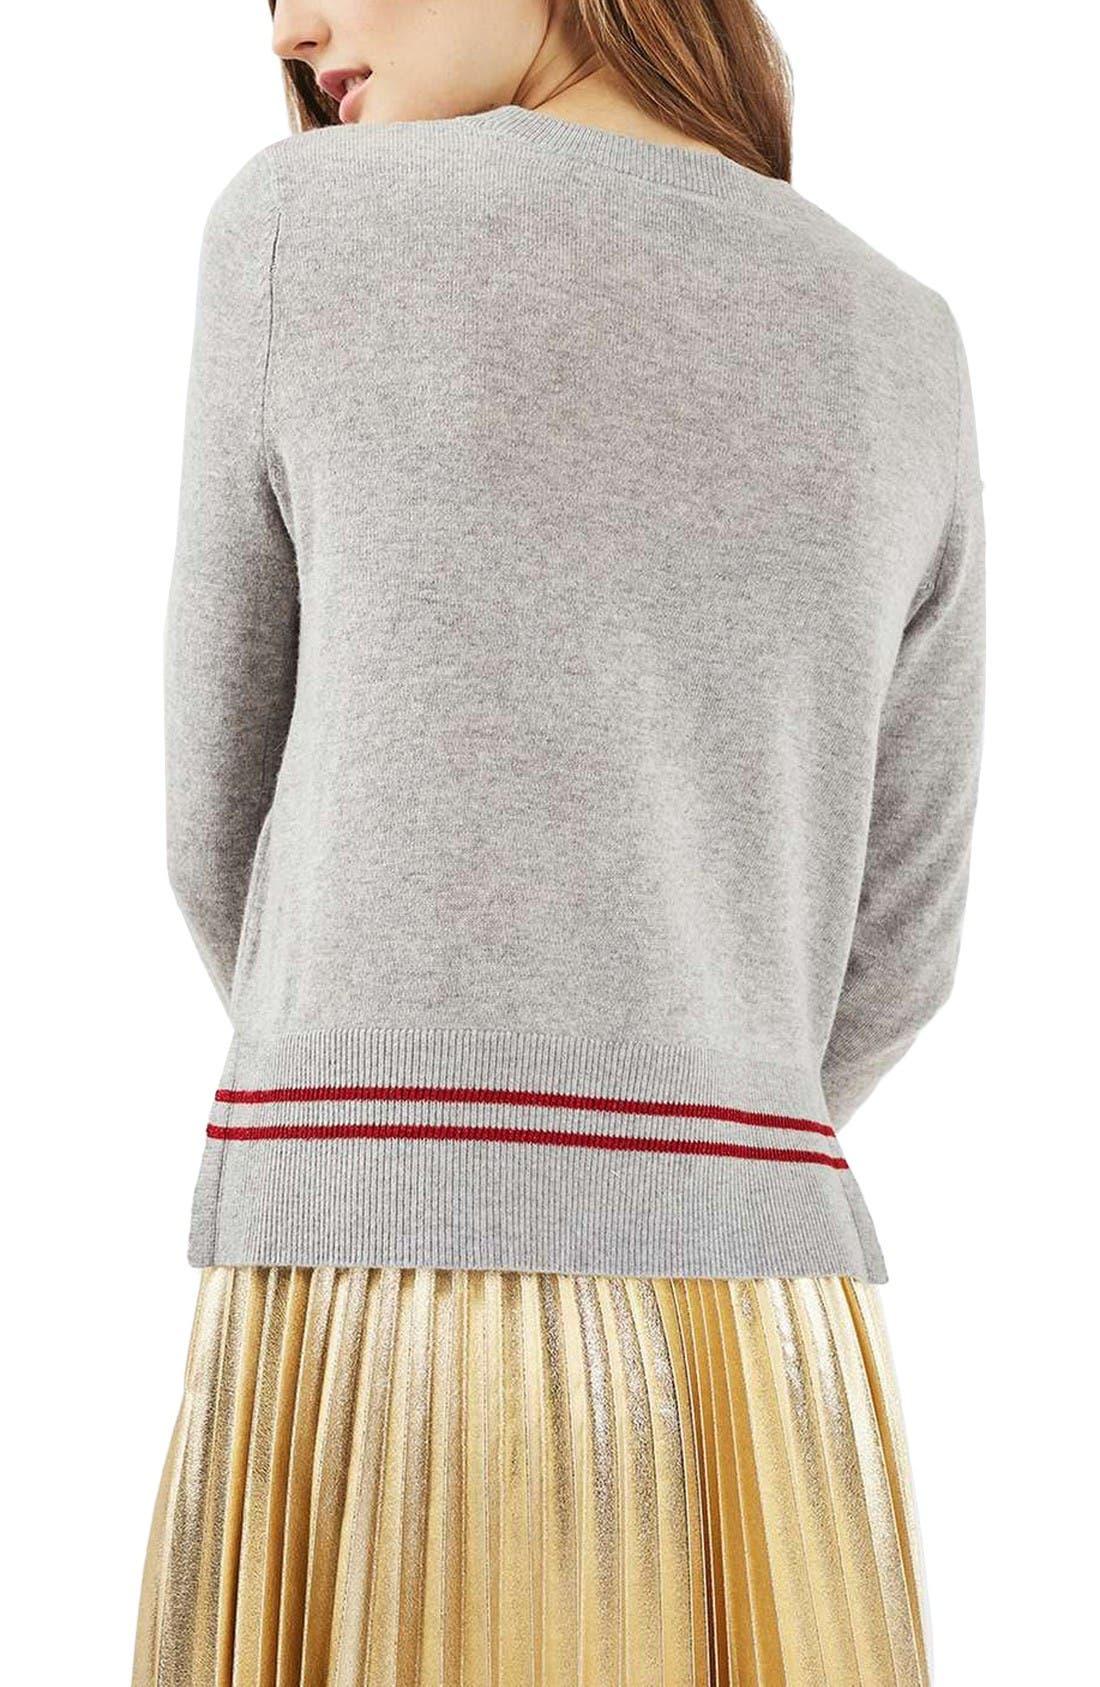 Alternate Image 3  - Topshop Sequin Embellished Cat Sweater (Petite)